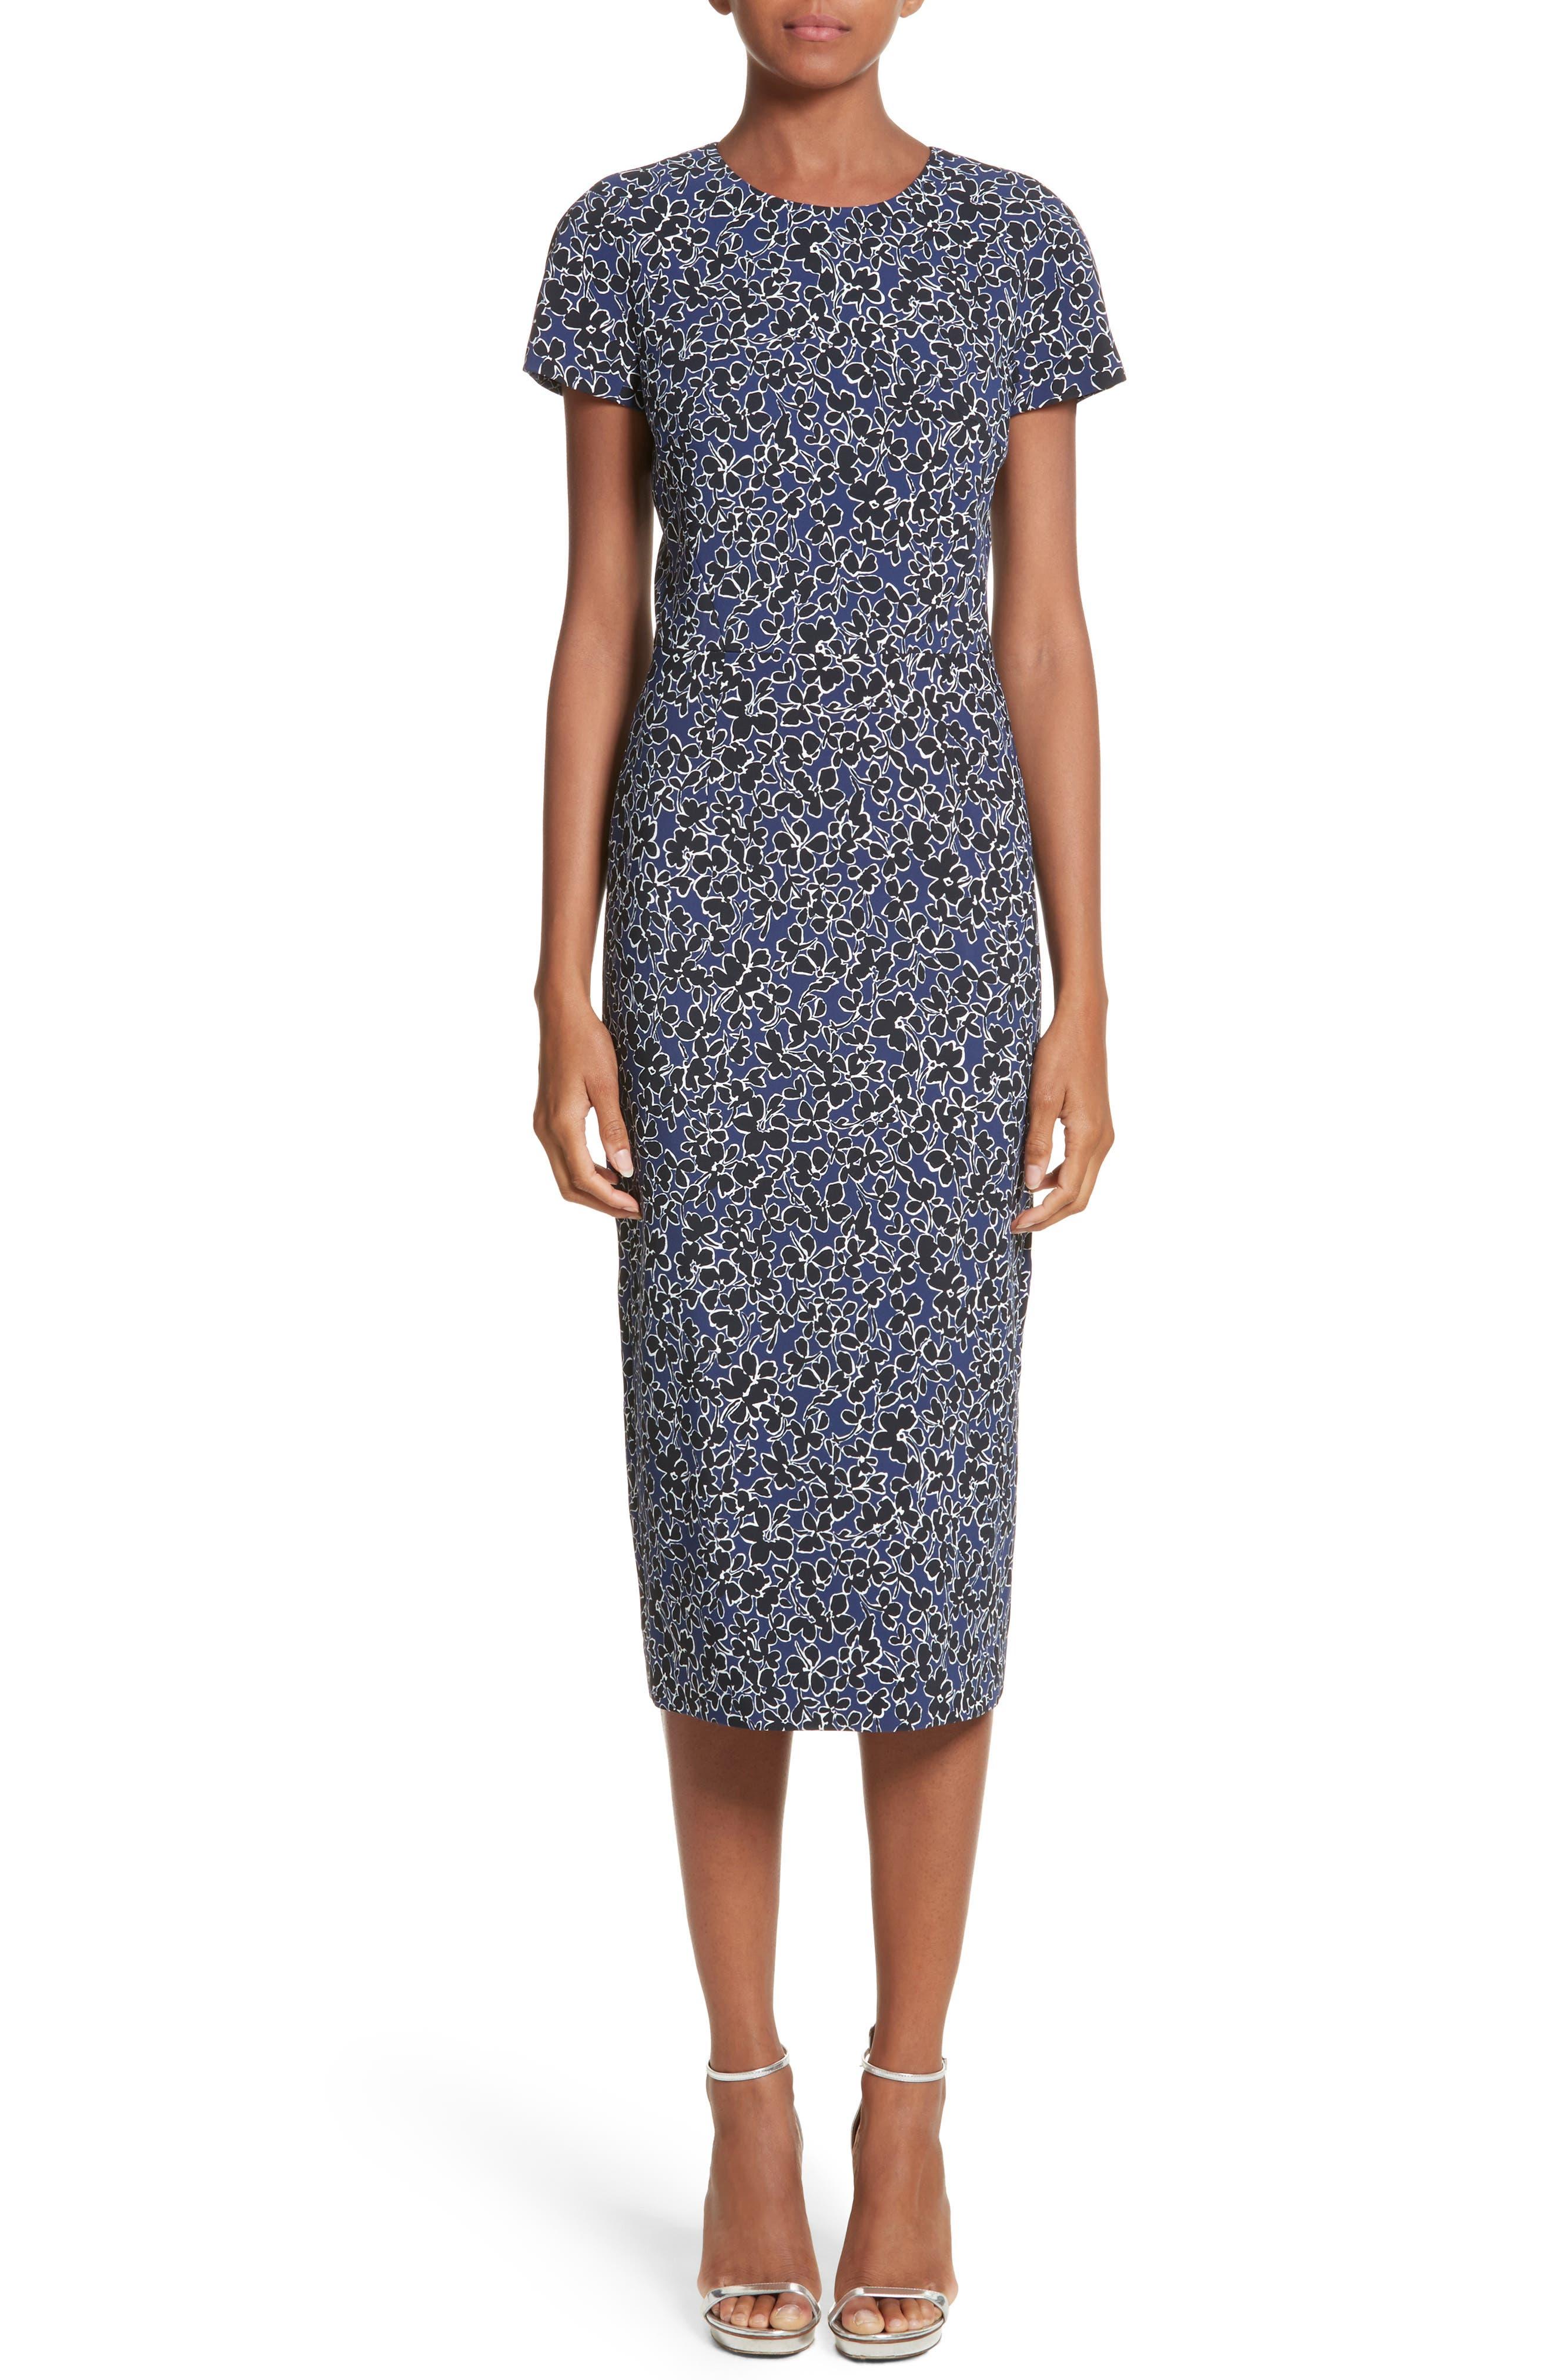 Main Image - Michael Kors Floral T-Shirt Sheath Dress